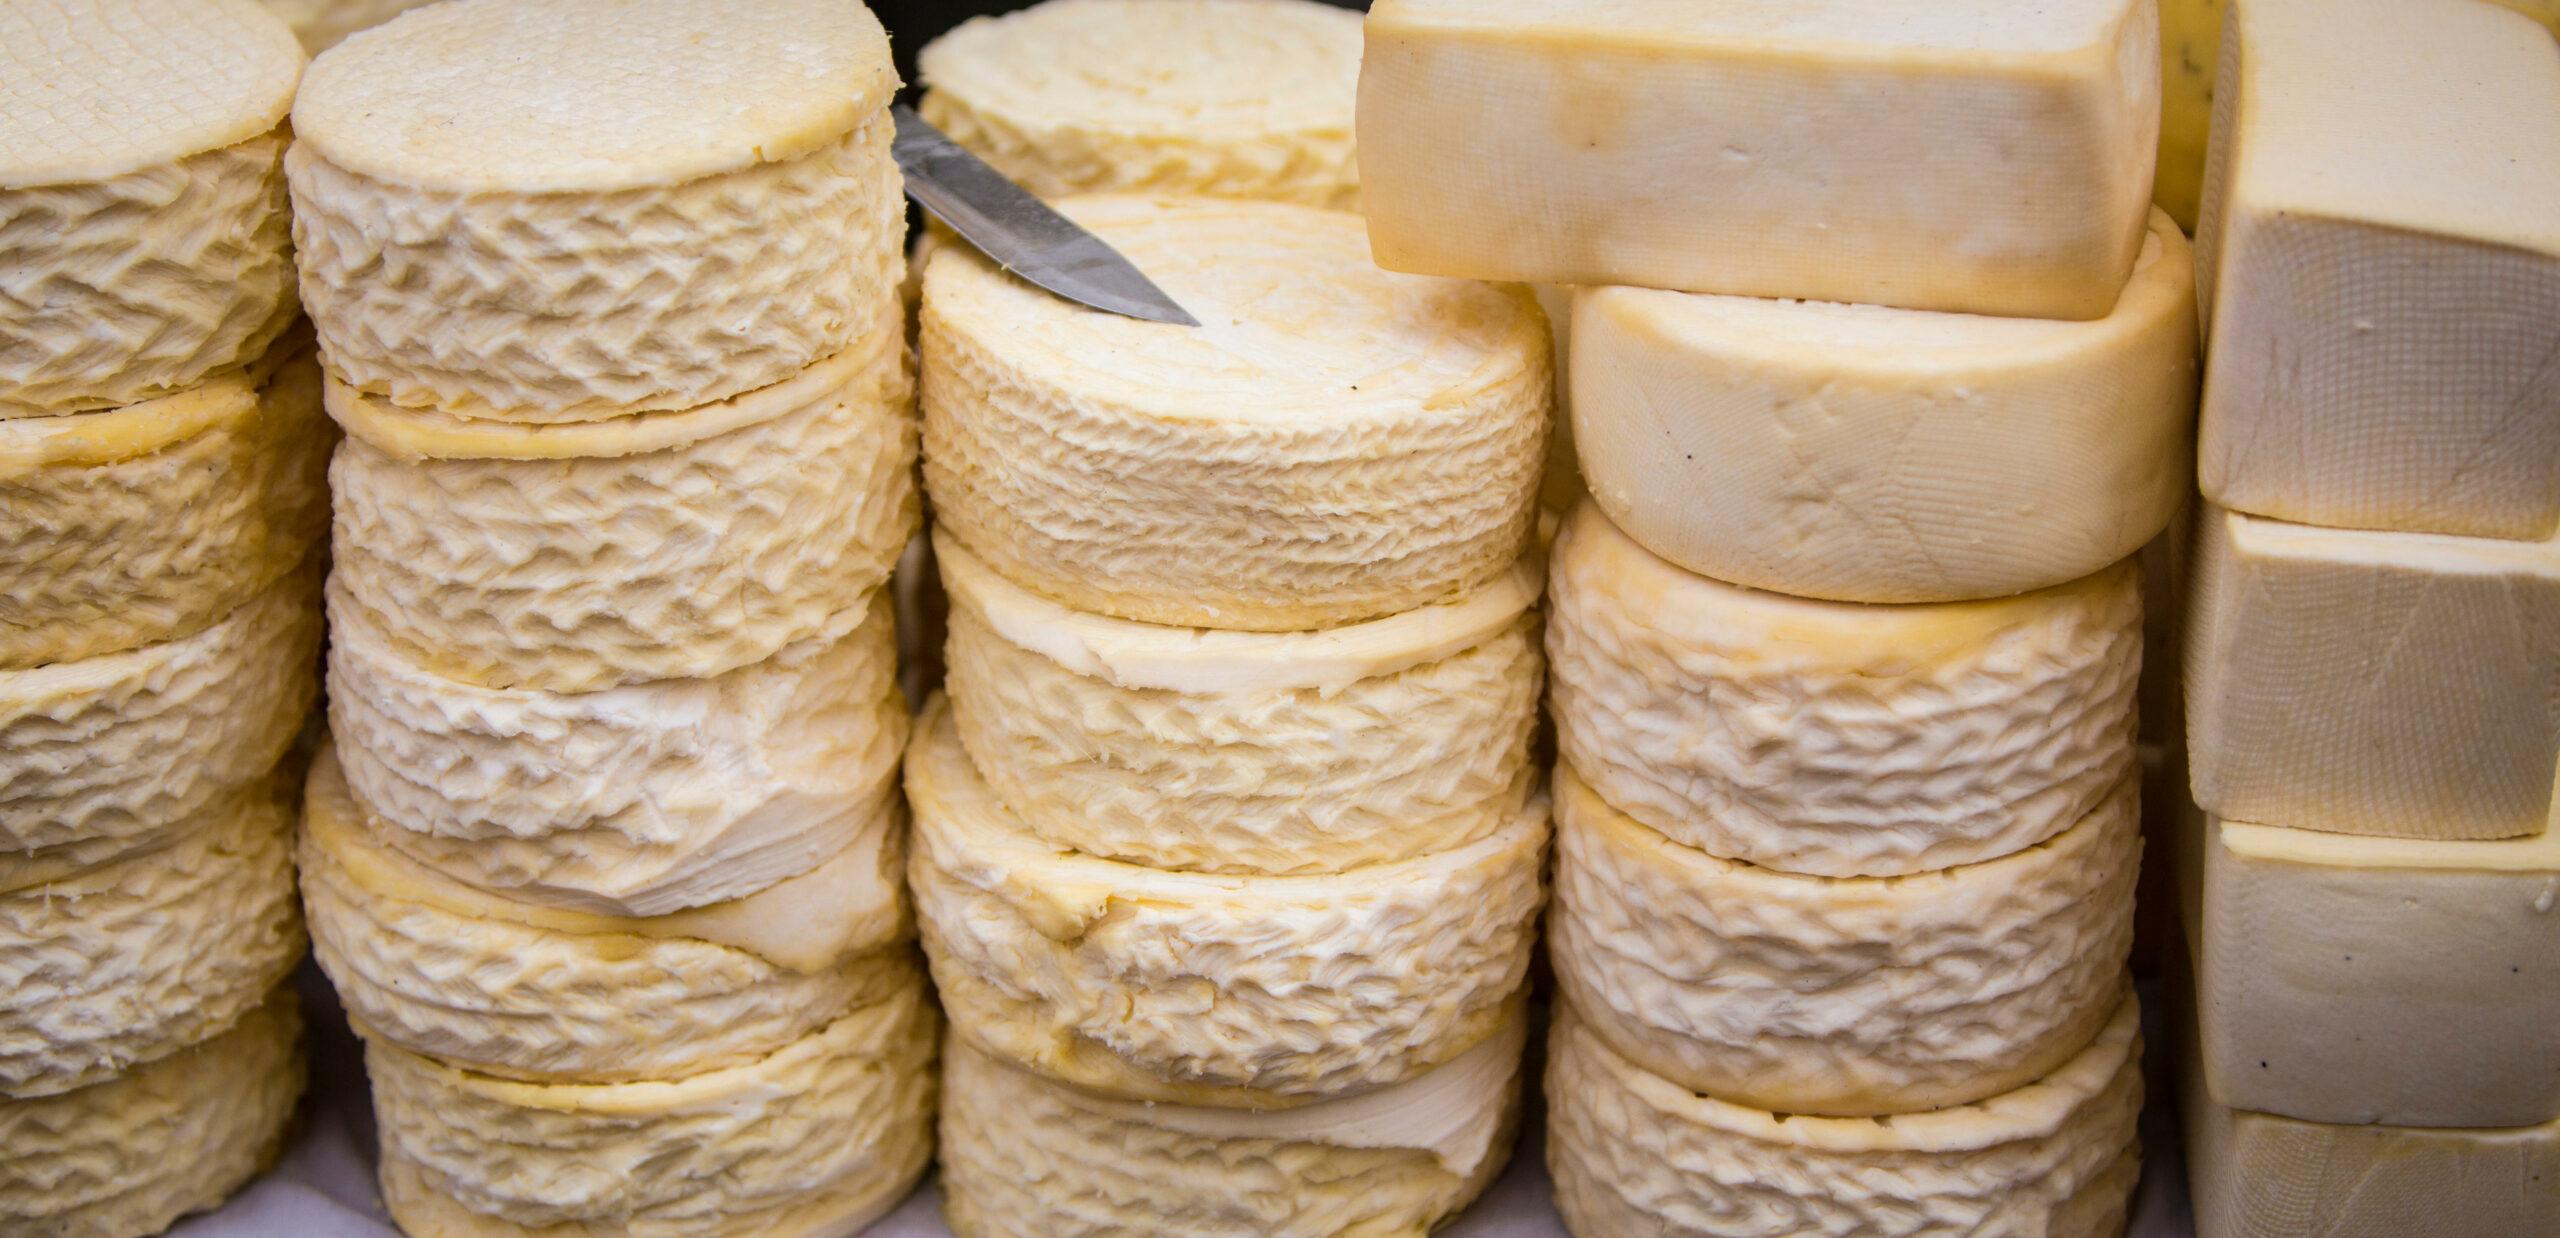 Alpaca cheese